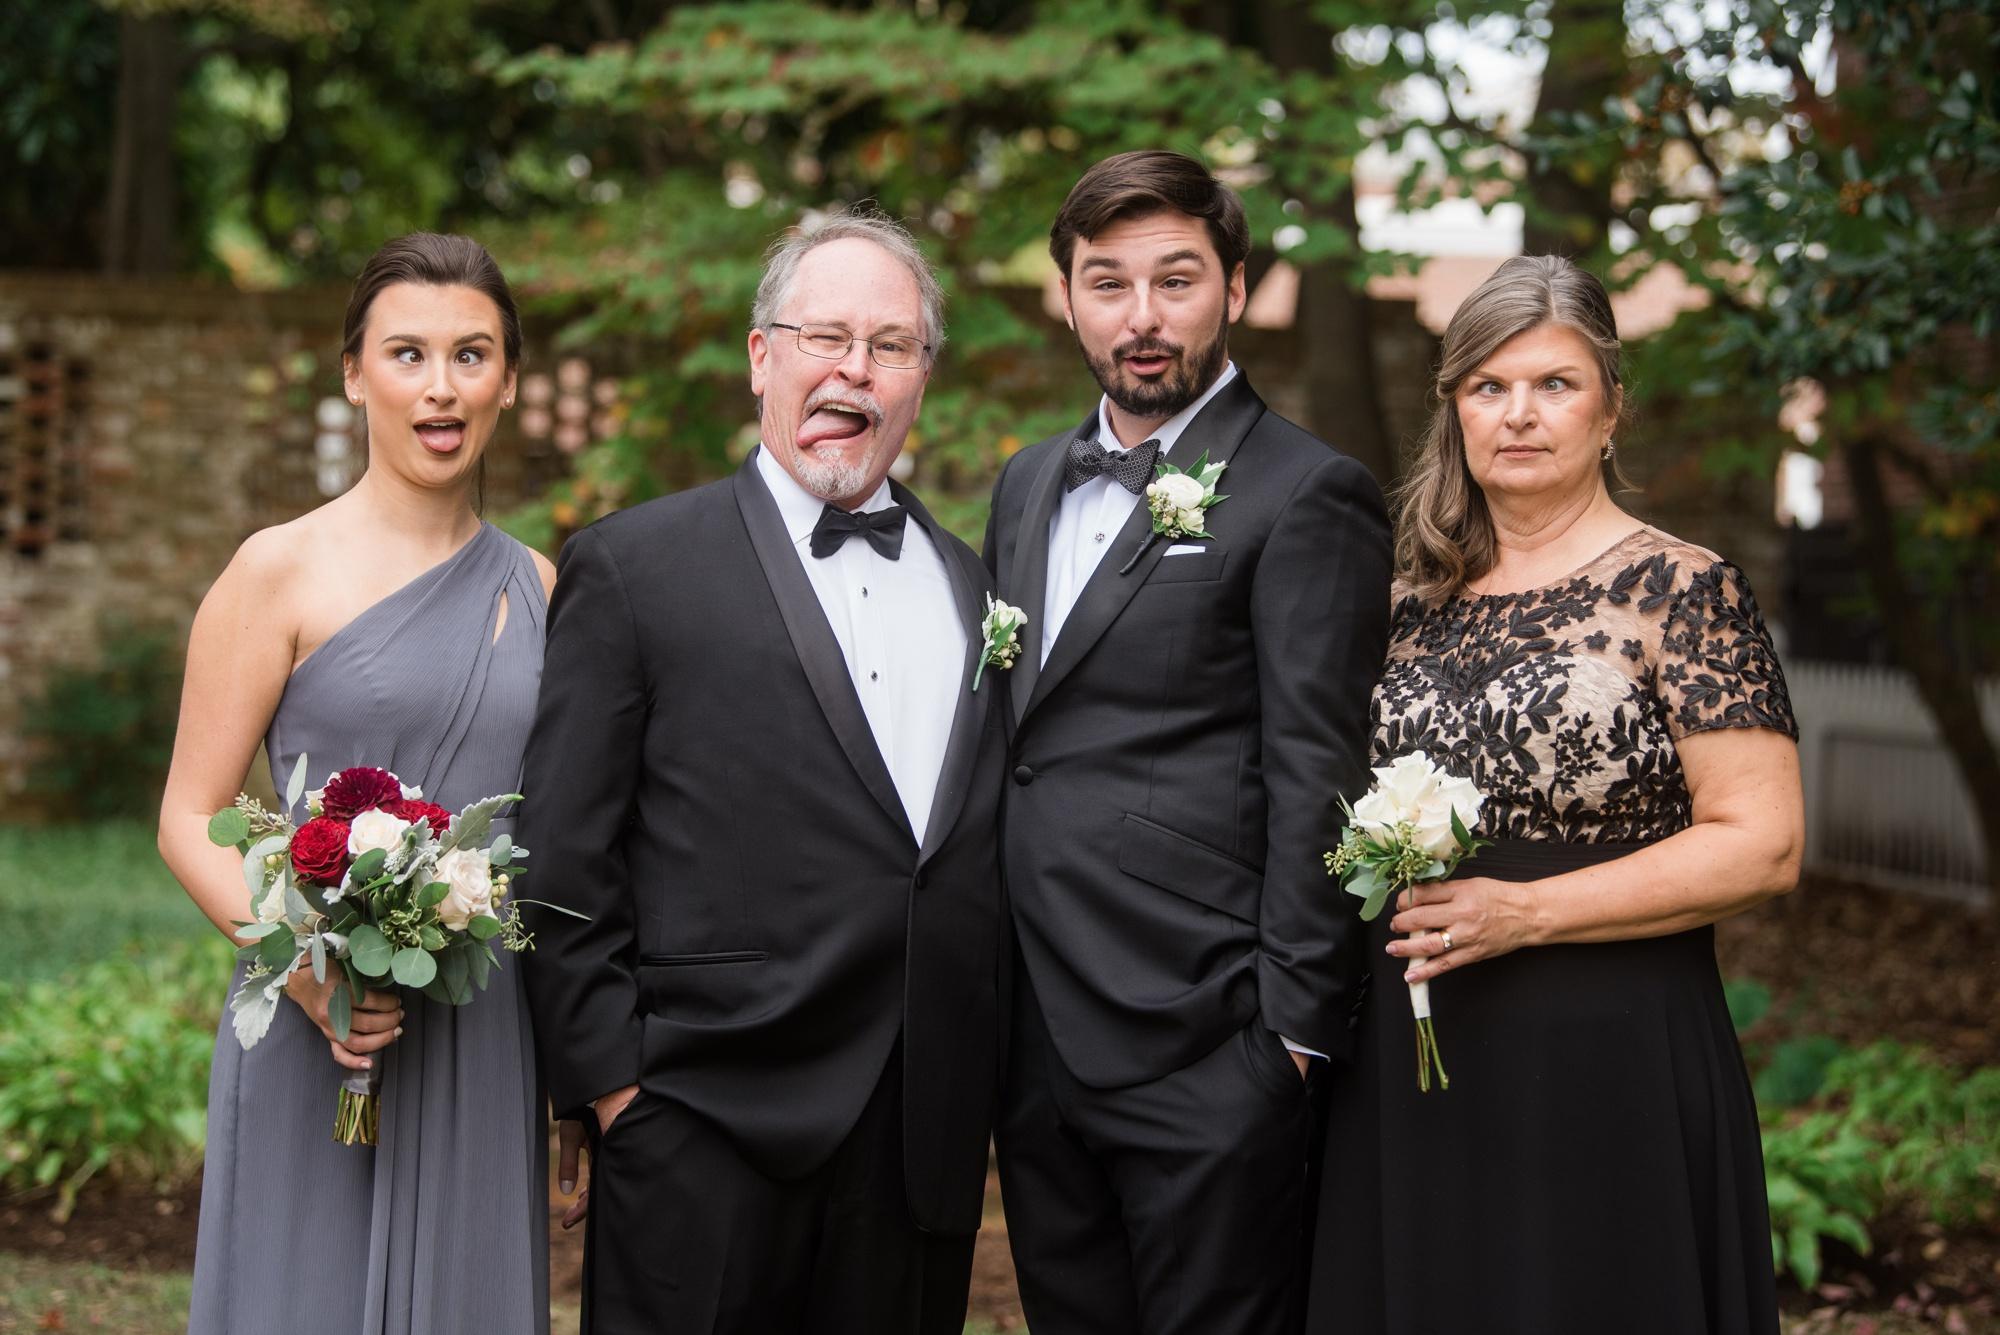 Easton maryland family photo